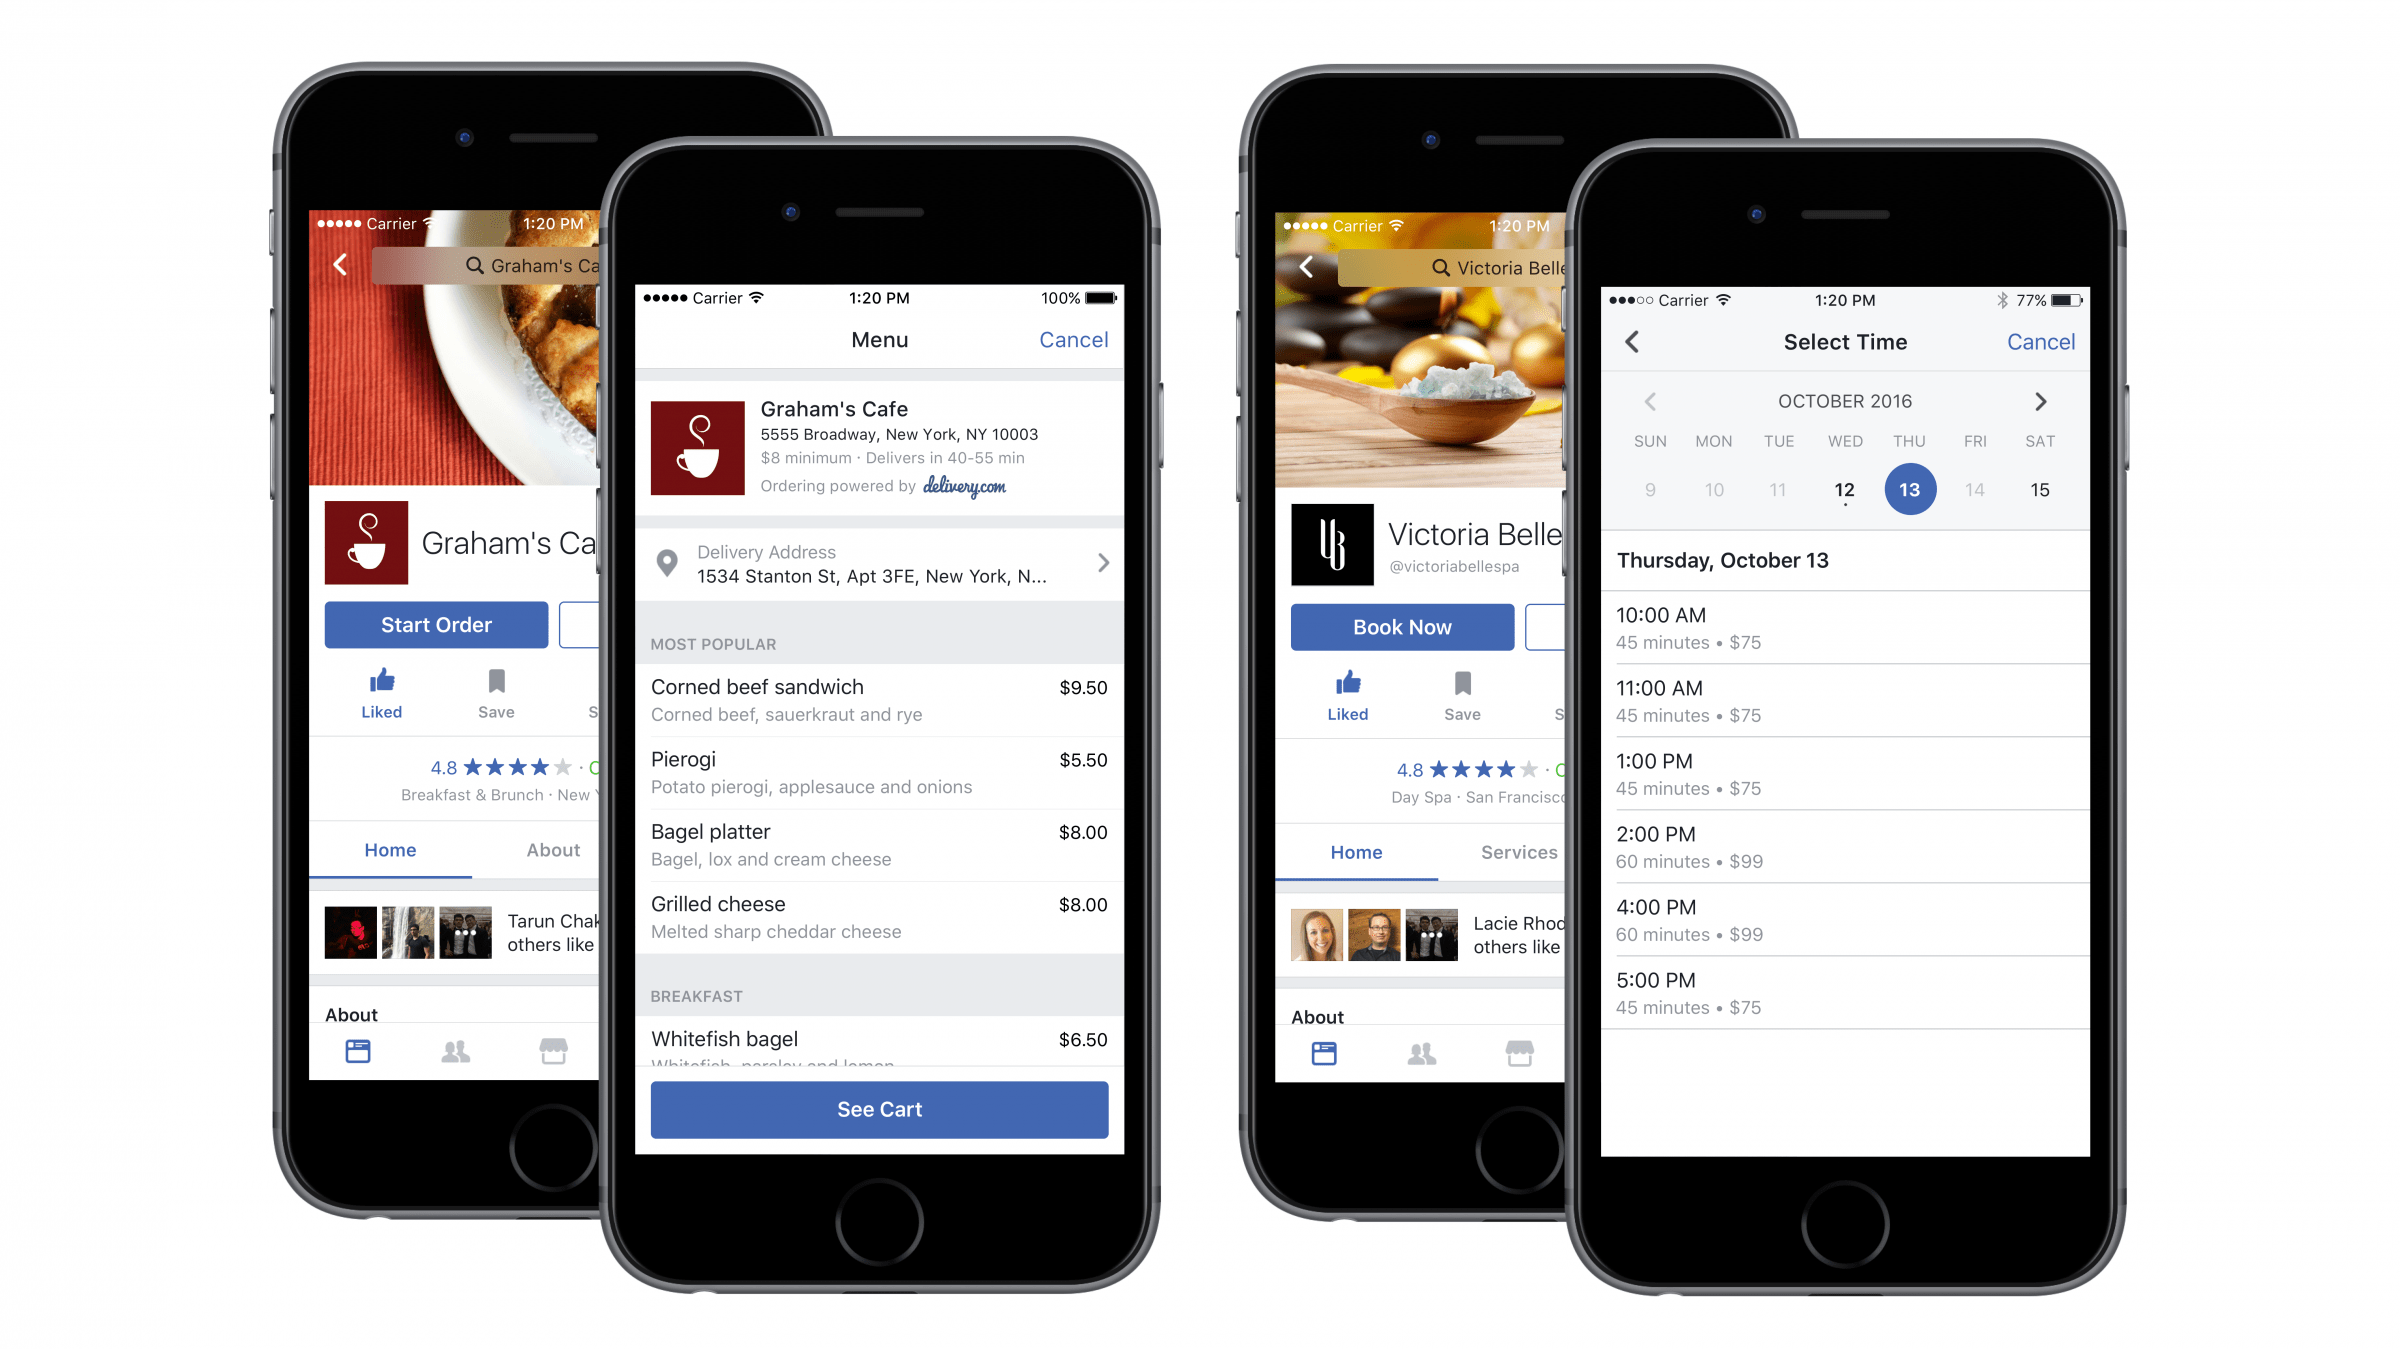 facebook-bilet-rezervasyon